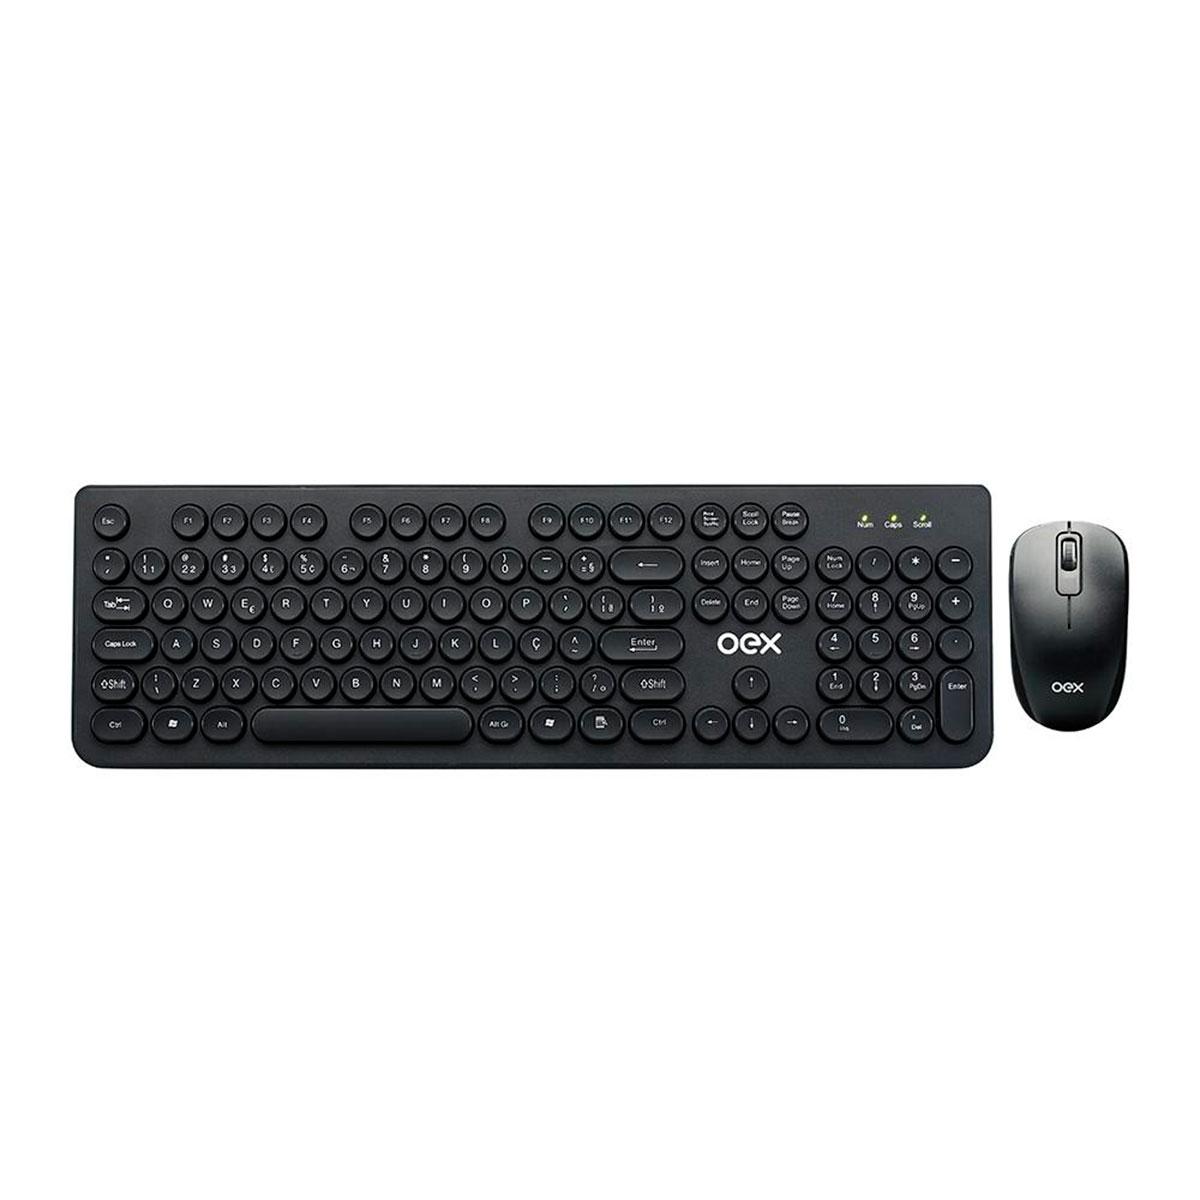 Kit Teclado e Mouse Wireless OEX POP+ TM410, Teclas Arredondadas, ABNT2, 1600 DPI, Preto